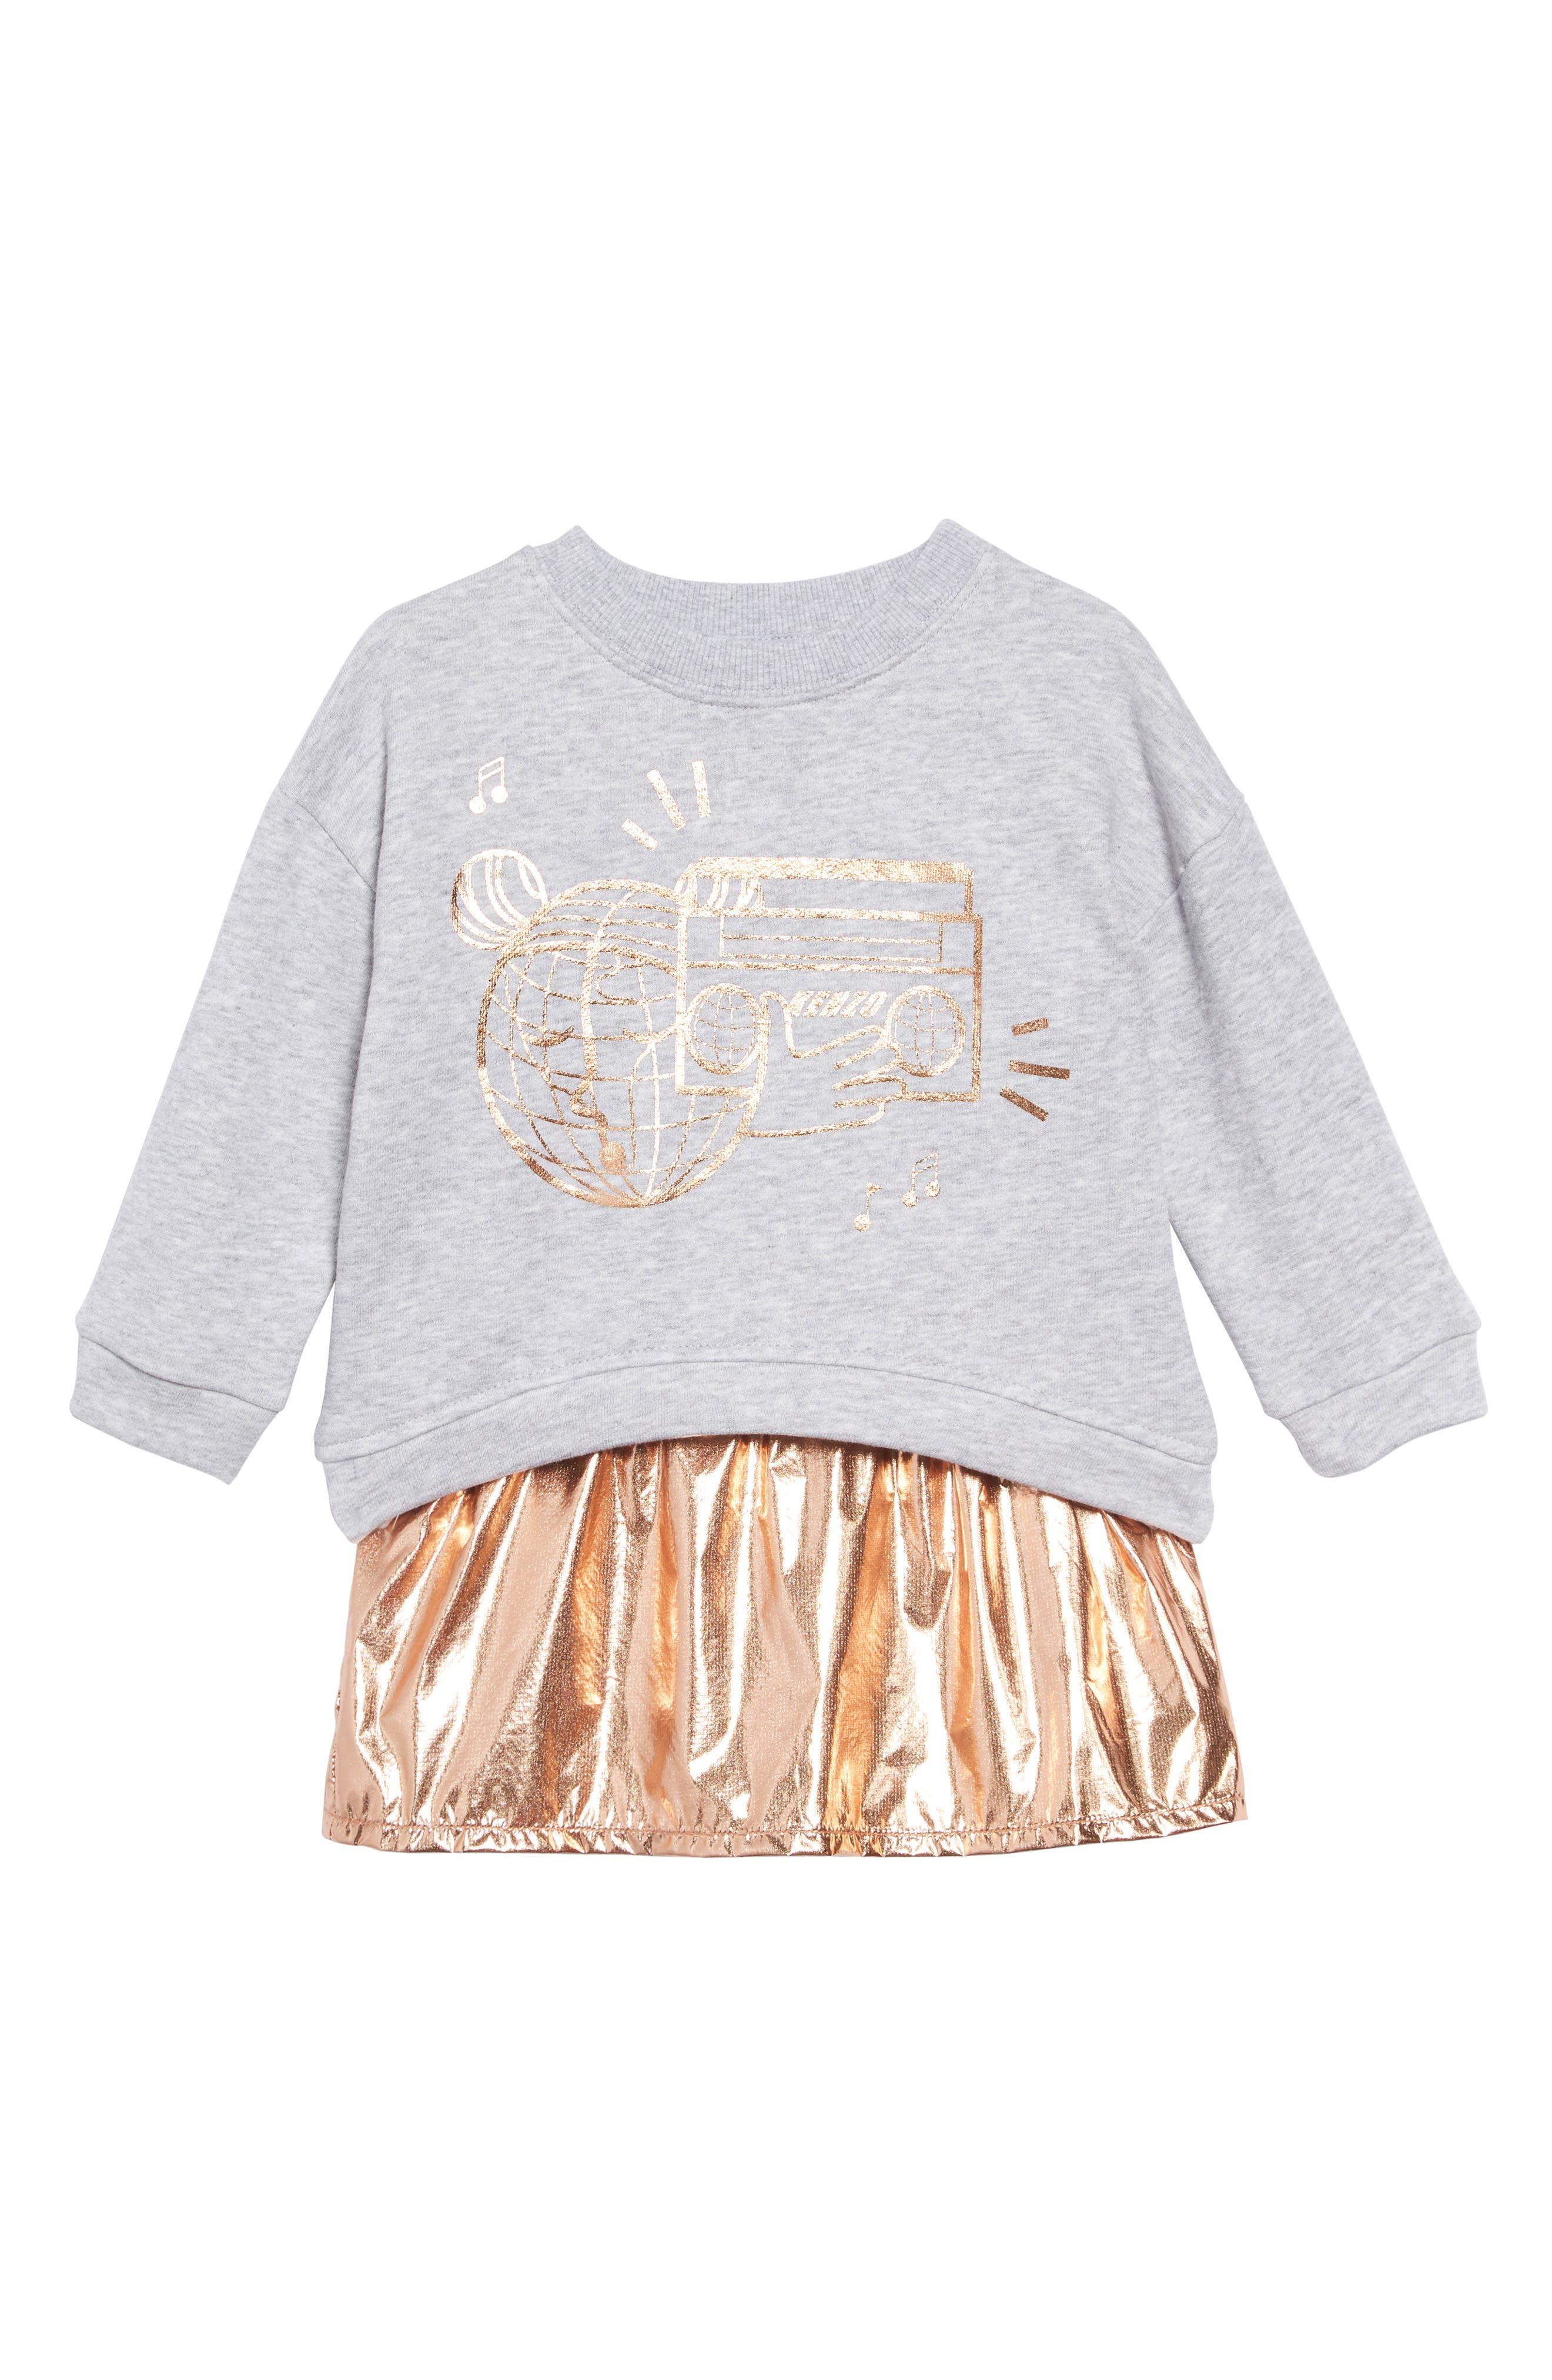 KENZO, Metallic Graphic Sweatshirt & Dress Set, Main thumbnail 1, color, COPPER